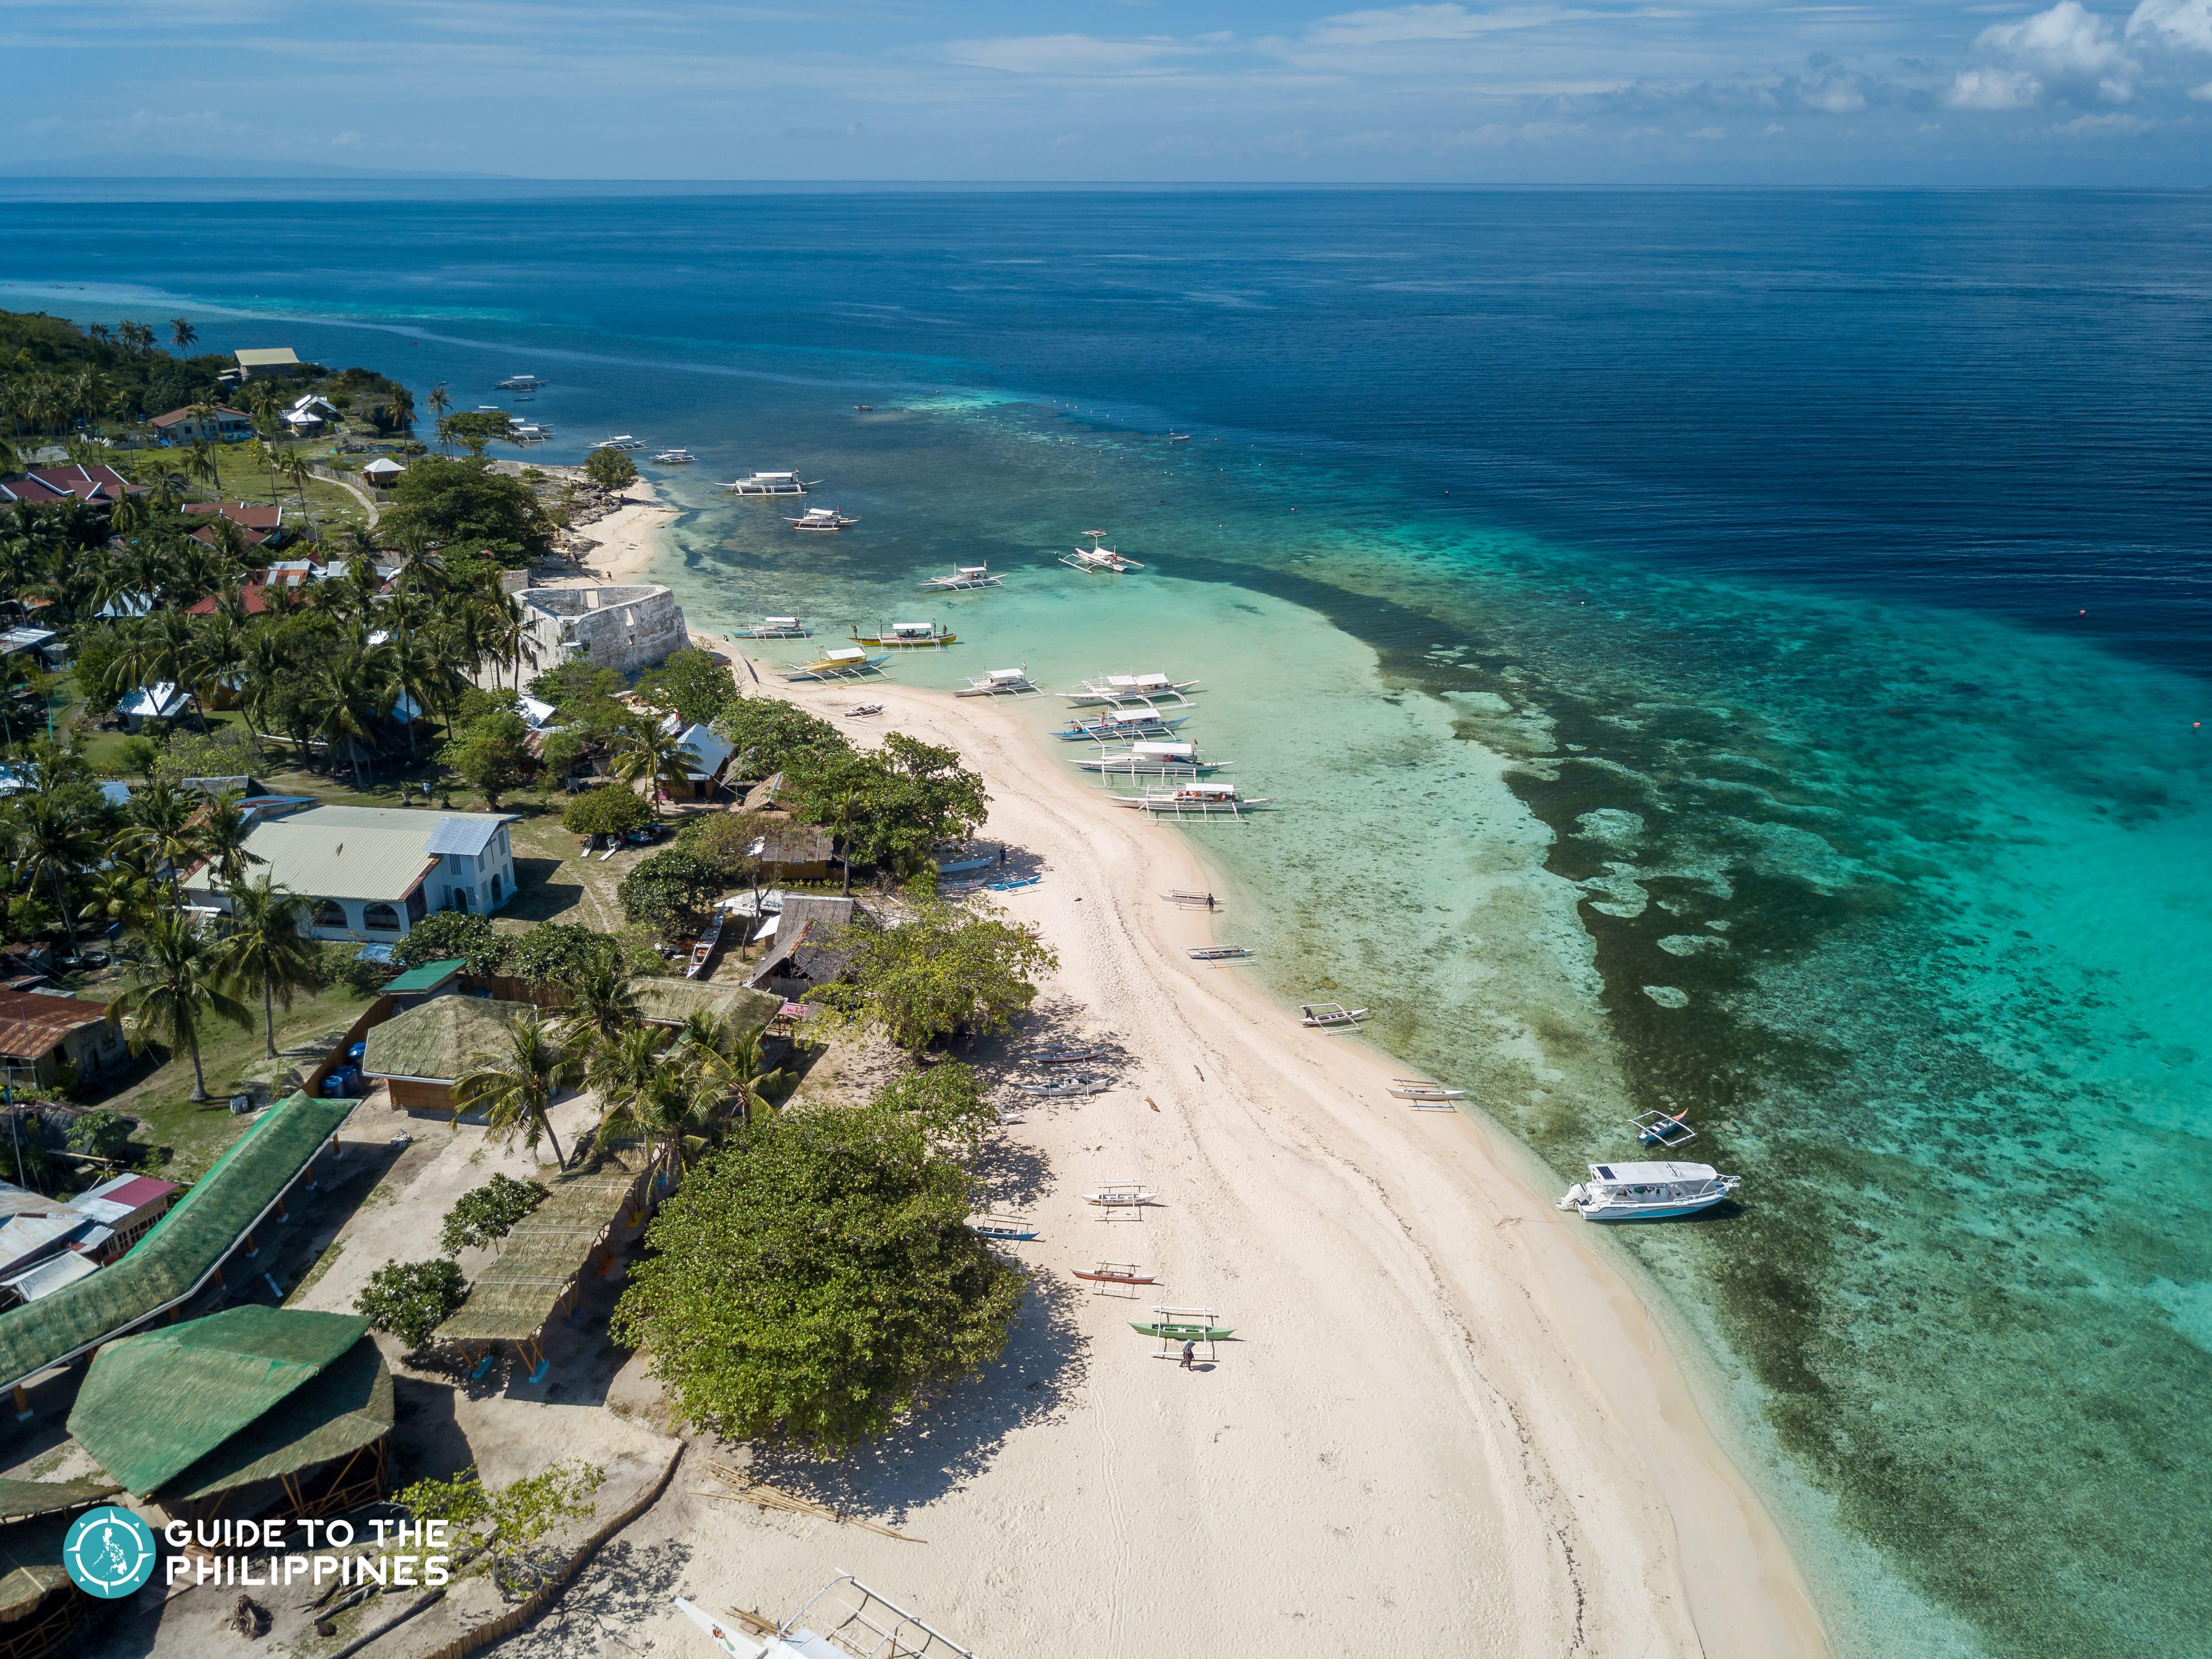 White sand beach of Pamilacan Island in Bohol